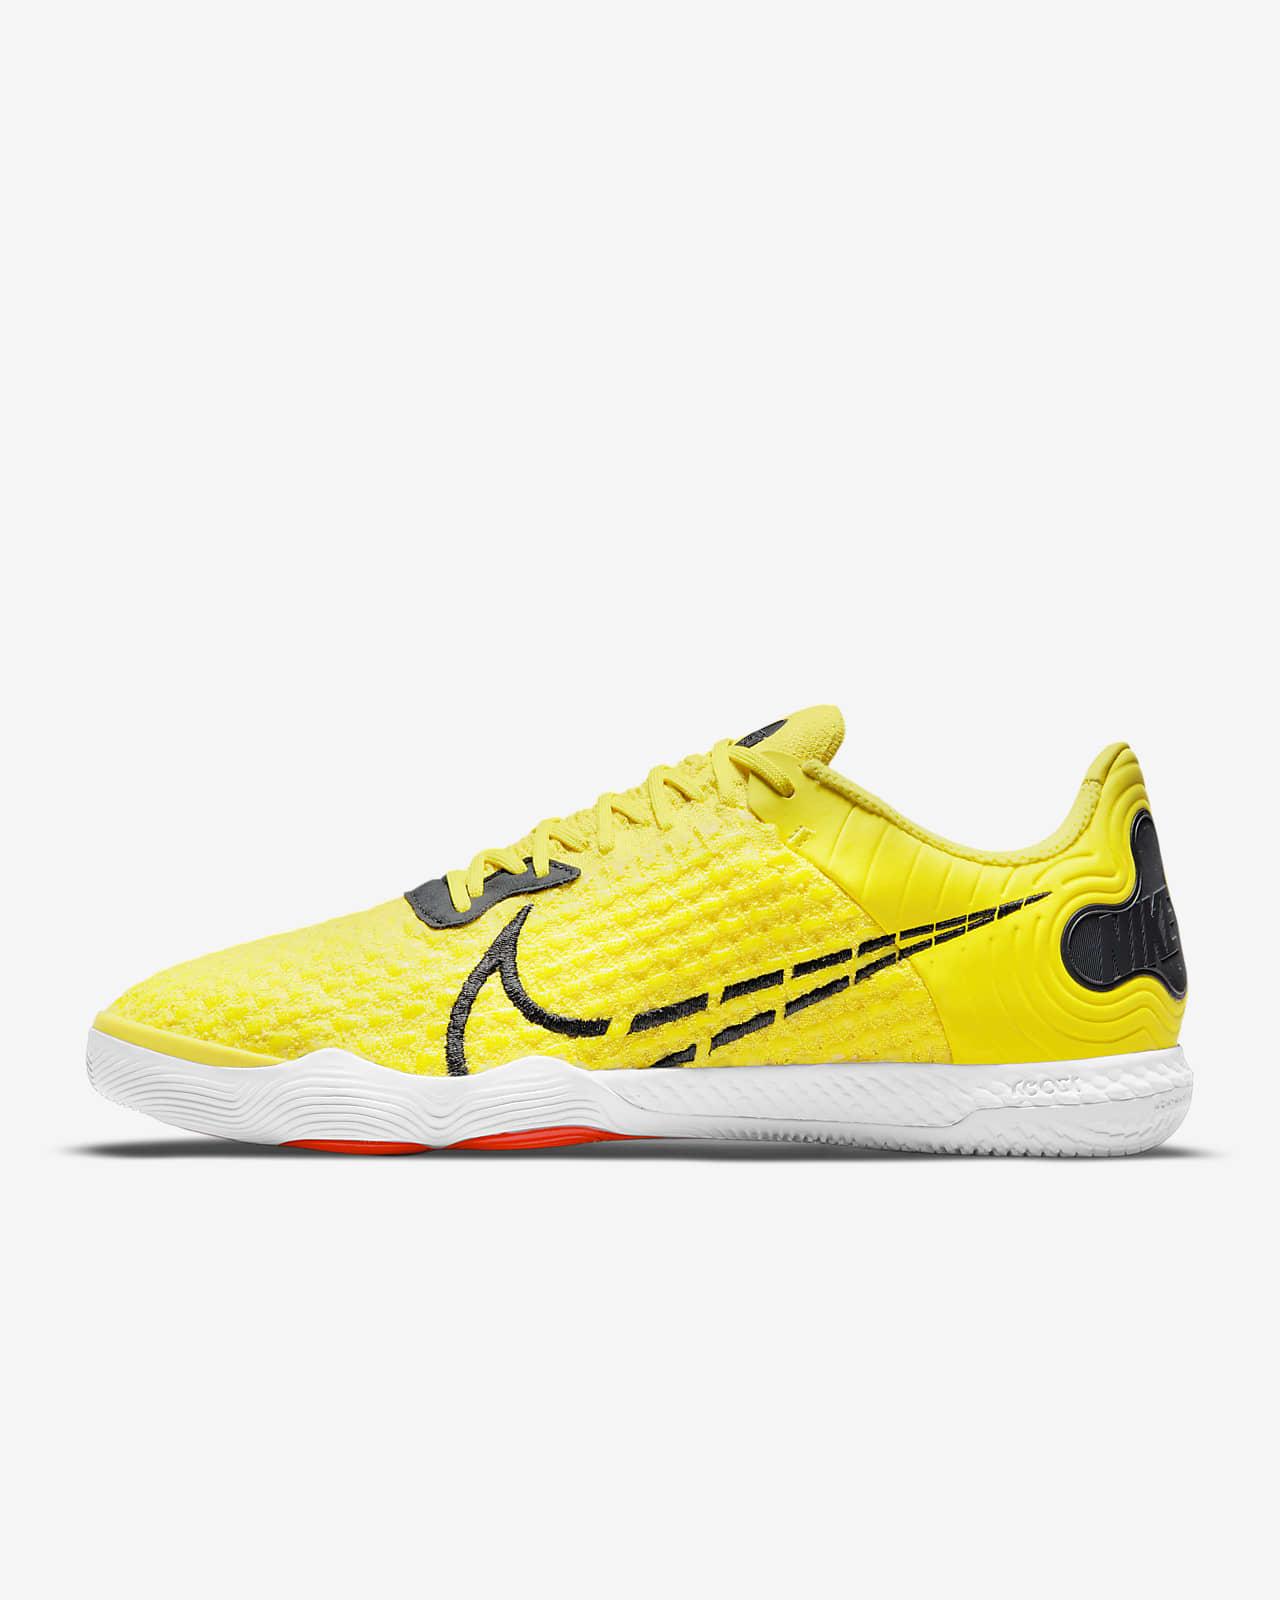 Scarpa da calcio per campo indoor/cemento Nike React Gato